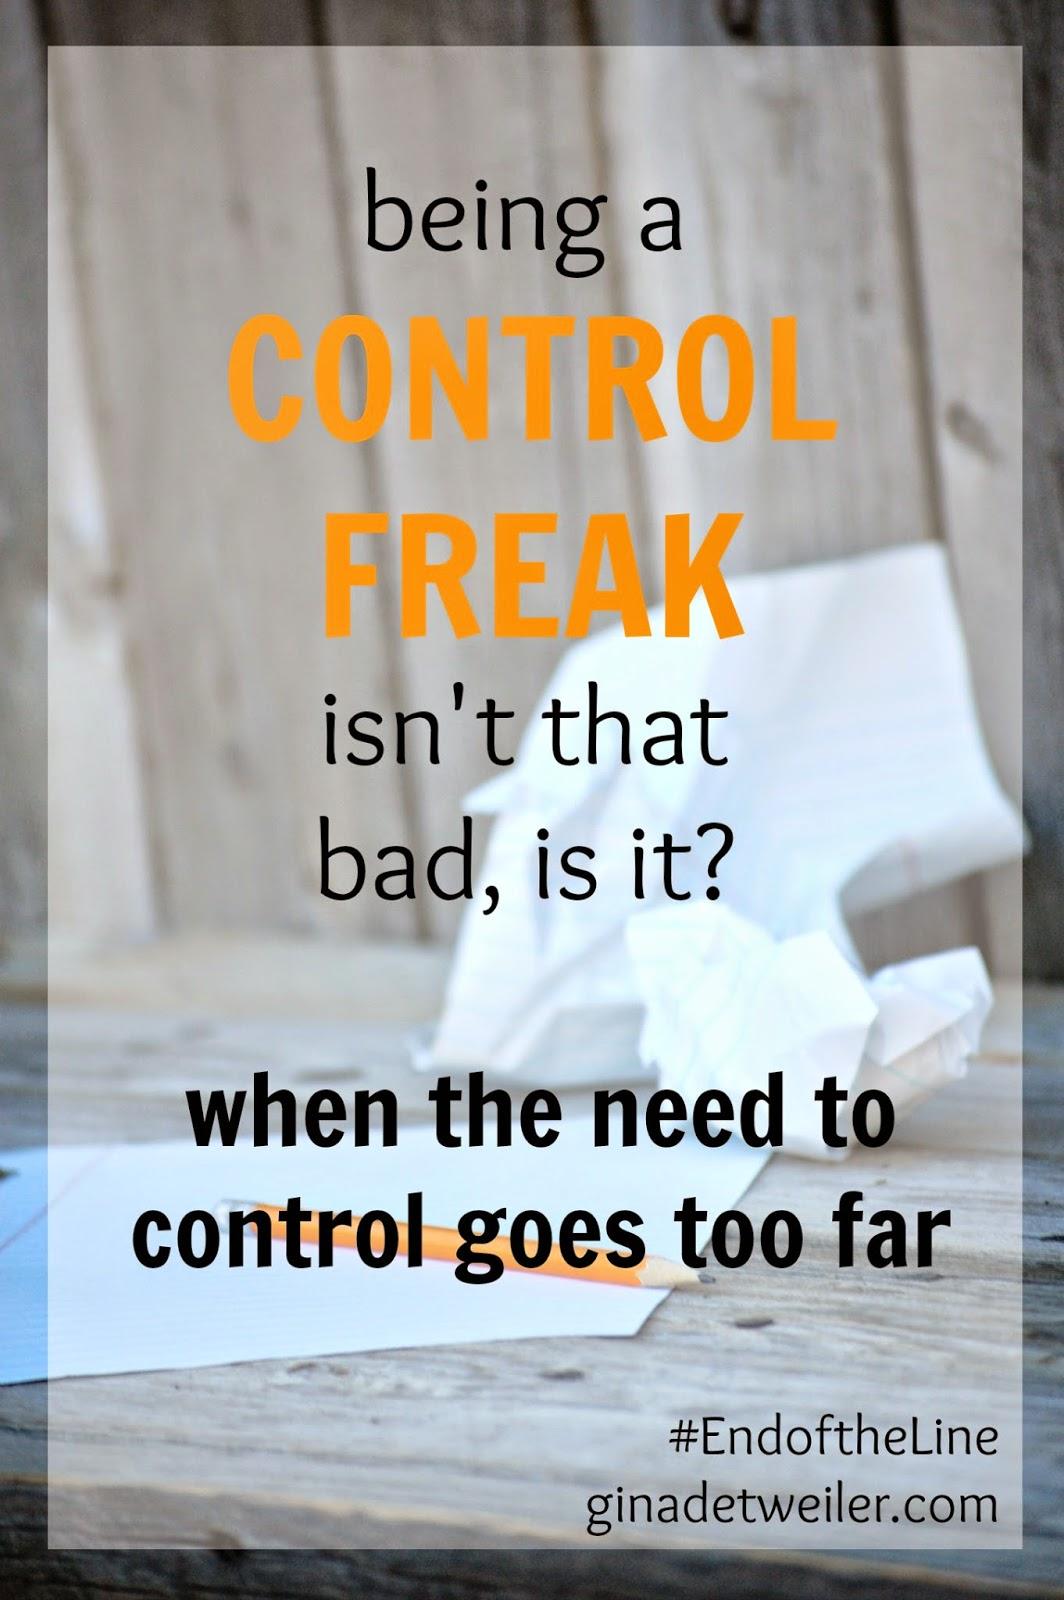 My husband is a control freak